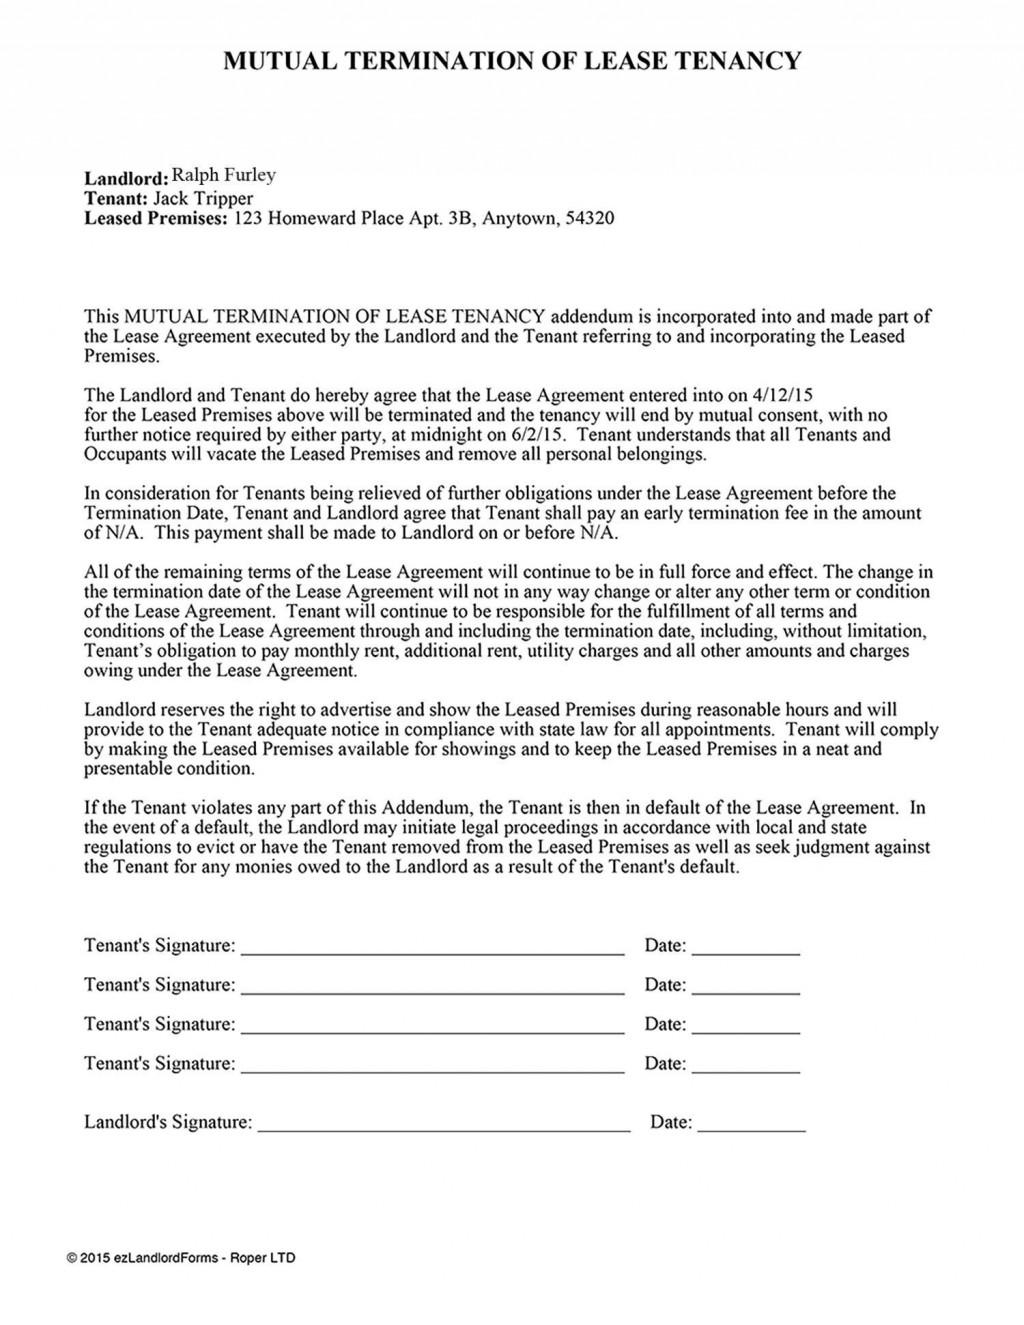 005 Unforgettable Addendum Form For Rental Agreement Photo Large